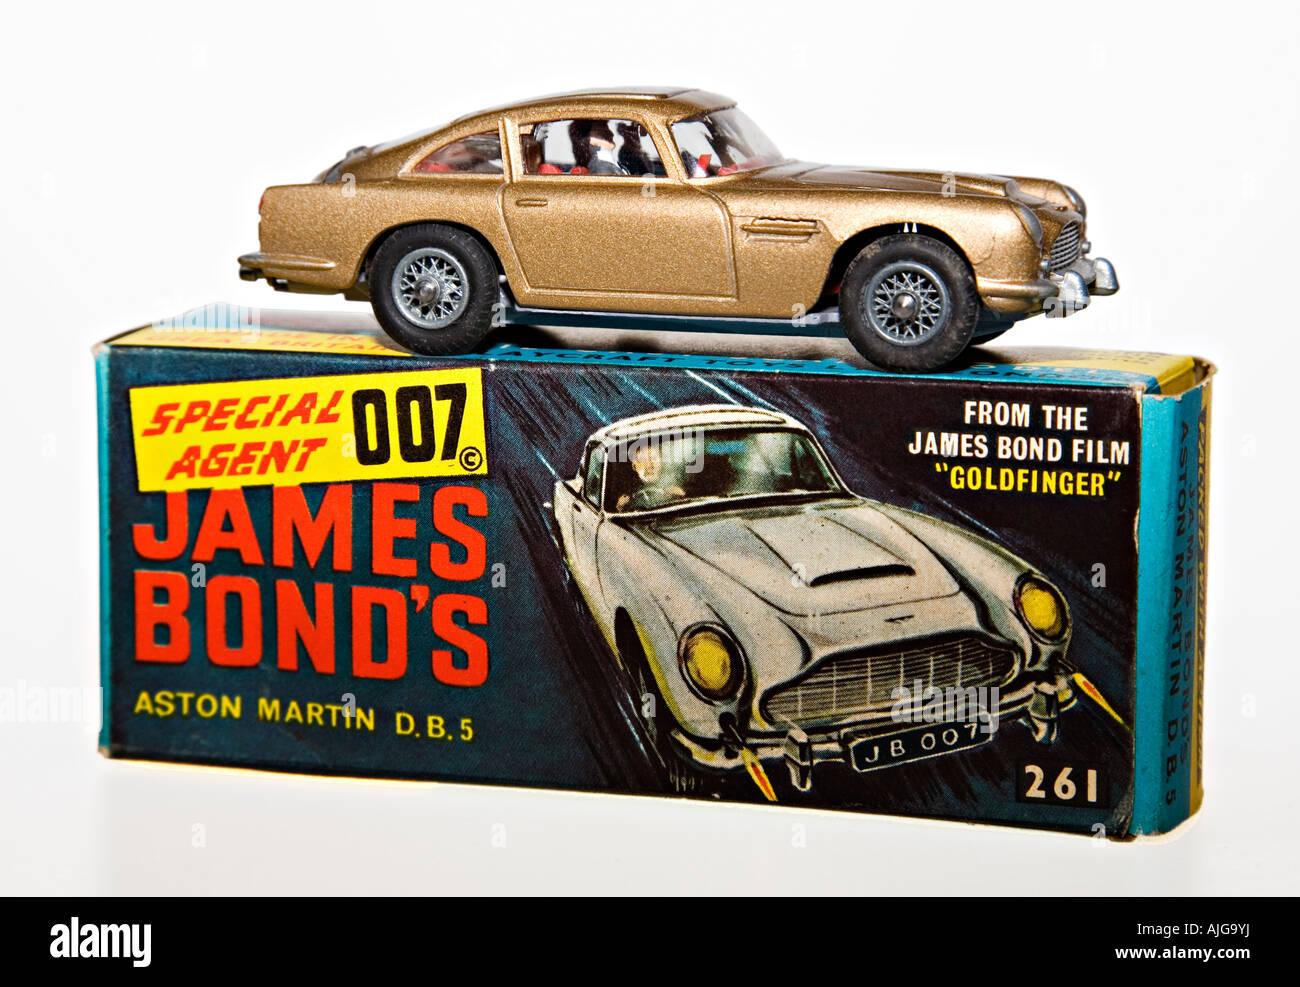 Corgi Modellauto James Bond 007 Aston Martin Db5 Mit Originalverpackung Stockfotografie Alamy